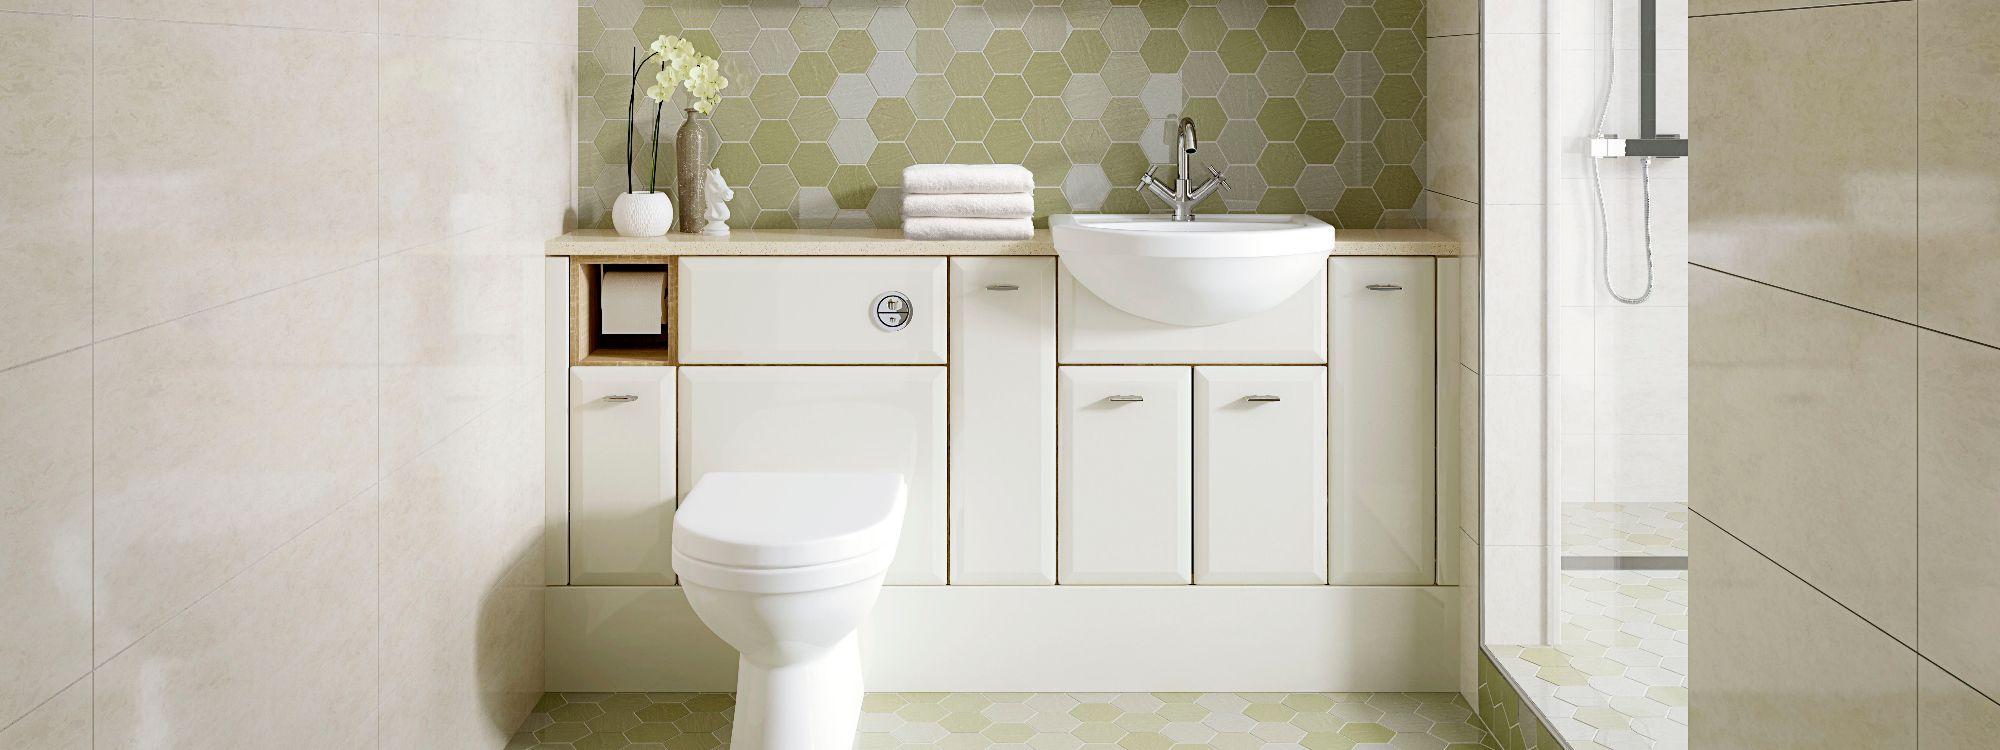 gloss white bathroom cupboards concealed wc cistern bathroom worktop derbyshire